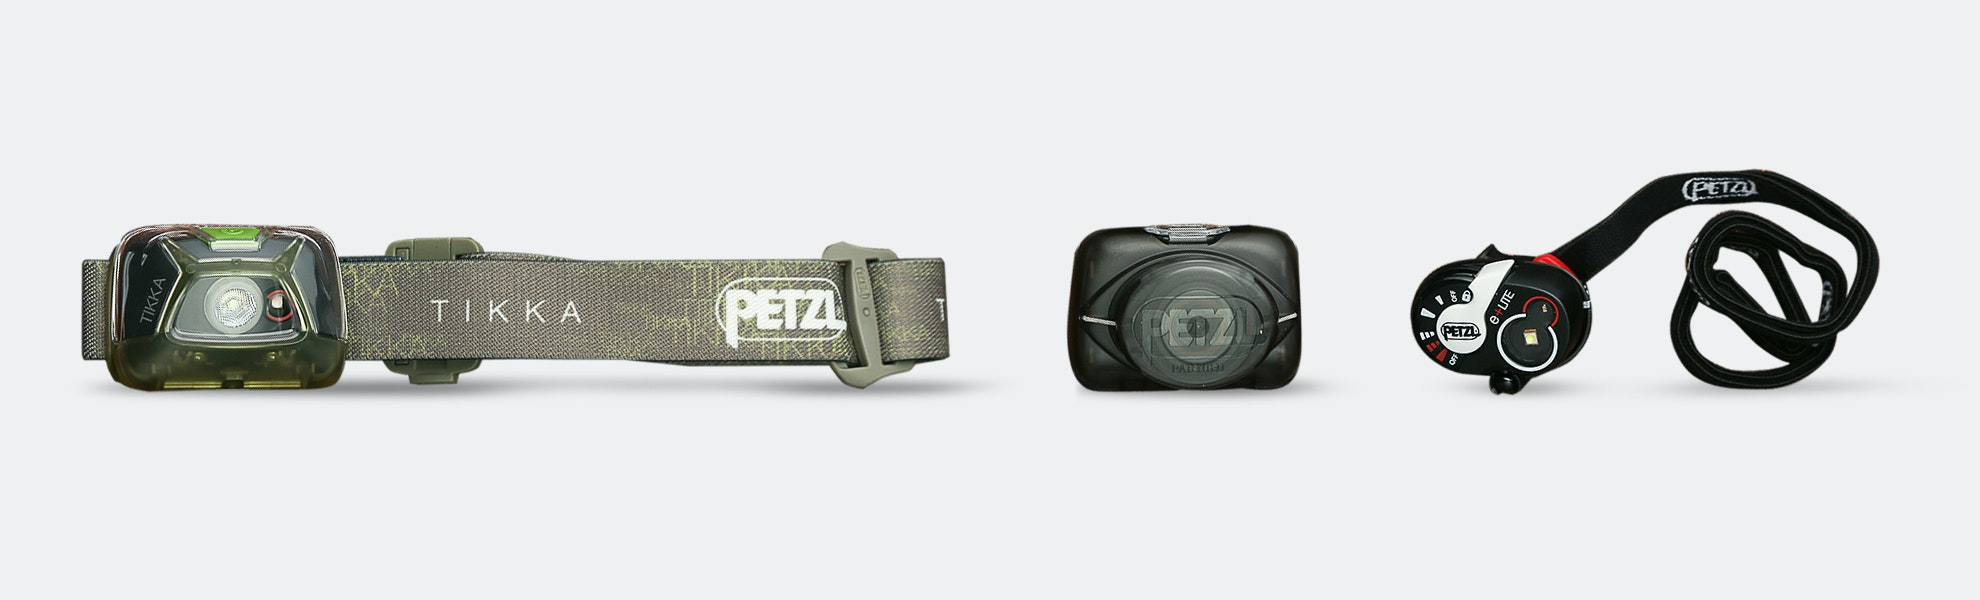 Petzl New e+Lite & Tikka Headlamps